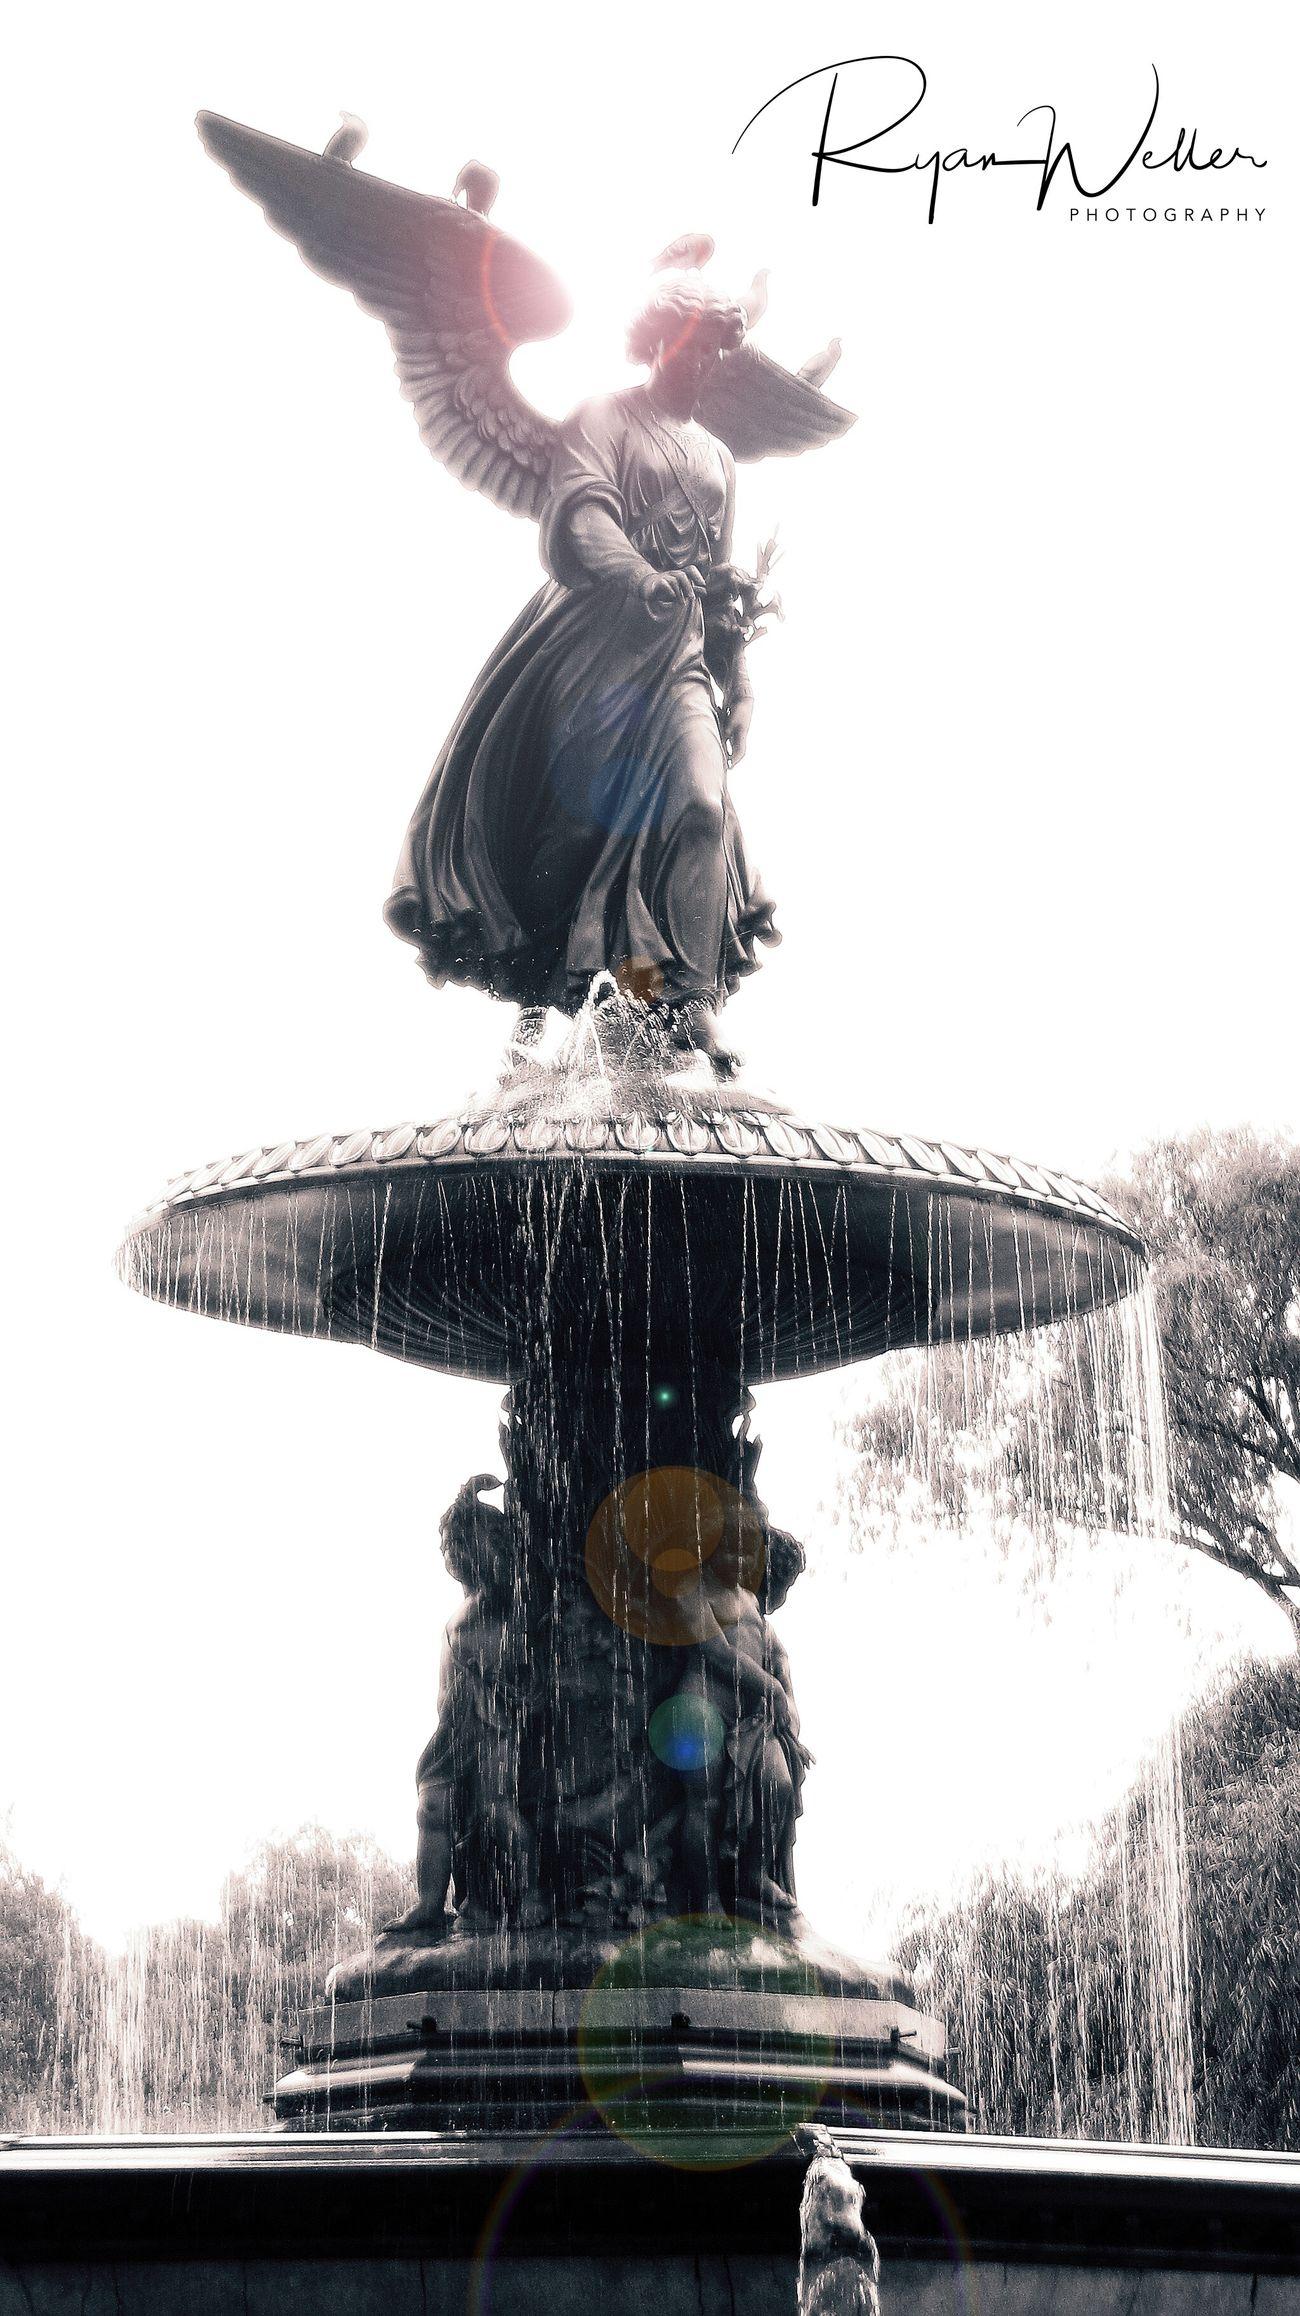 Statue Travel Destinations Outdoors Sculpture Water Manhattan New York City Central Park Lighting